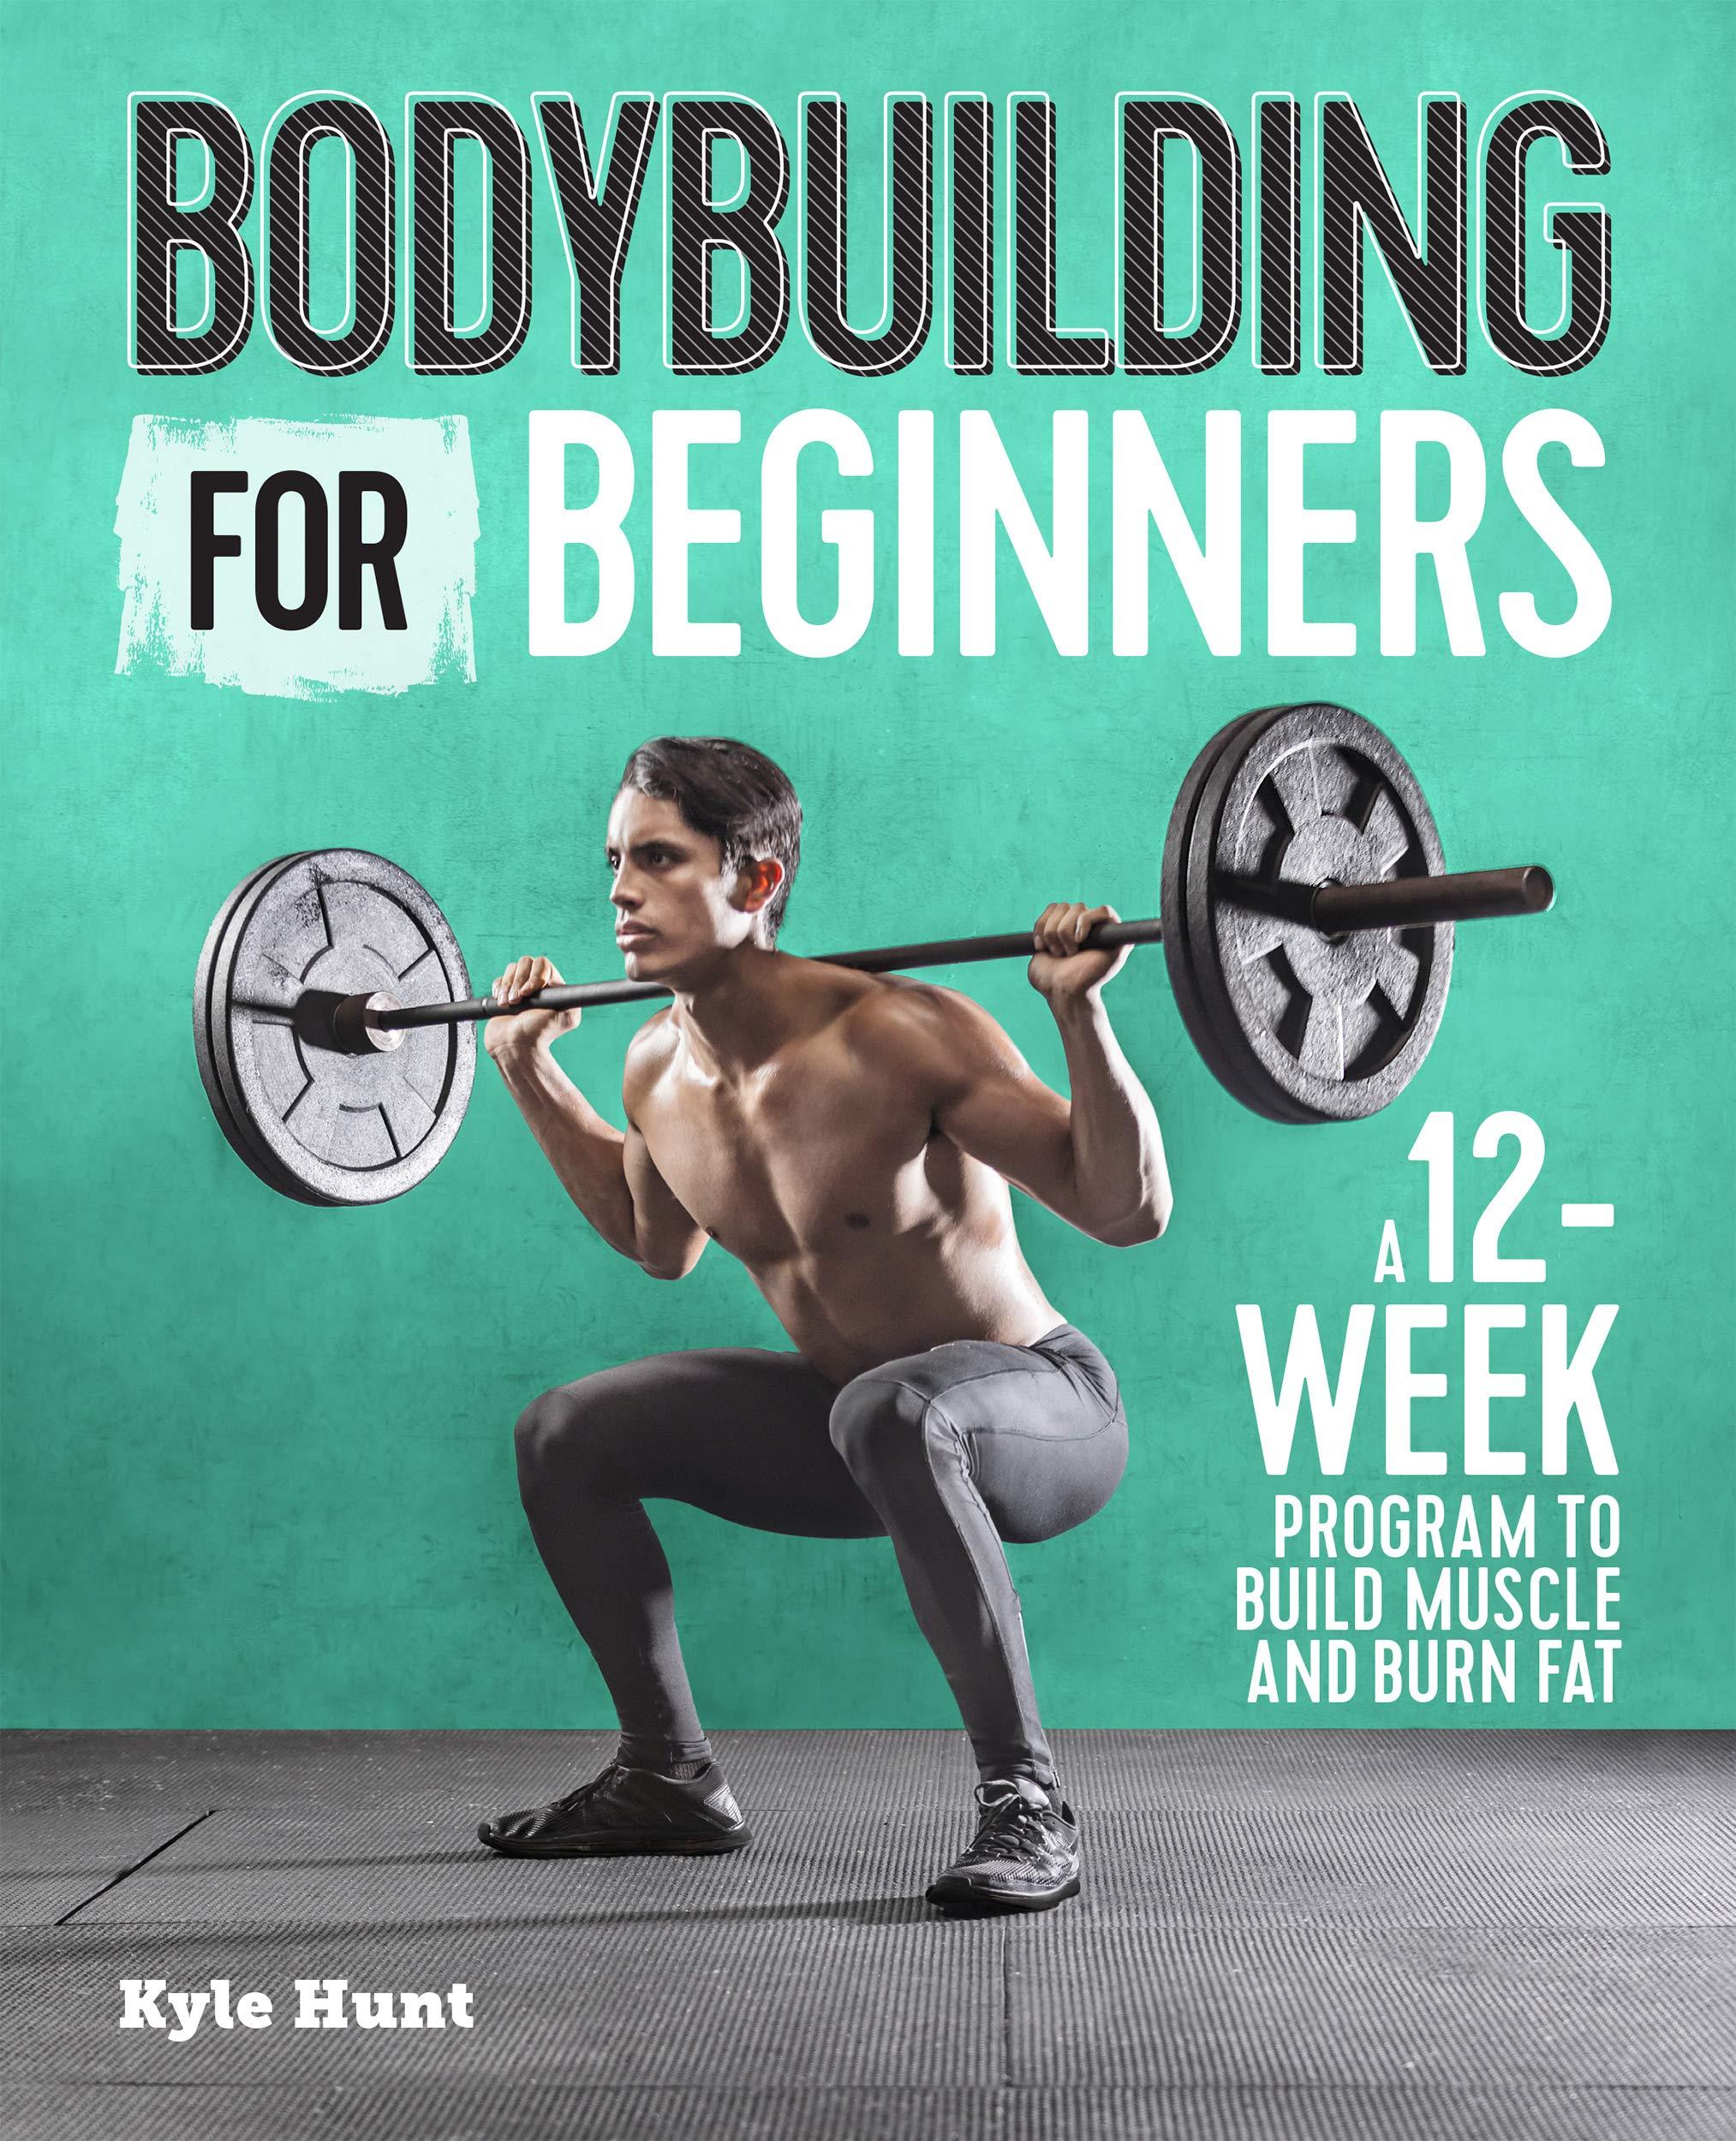 Bodybuilding Beginners 12 Week Program Muscle